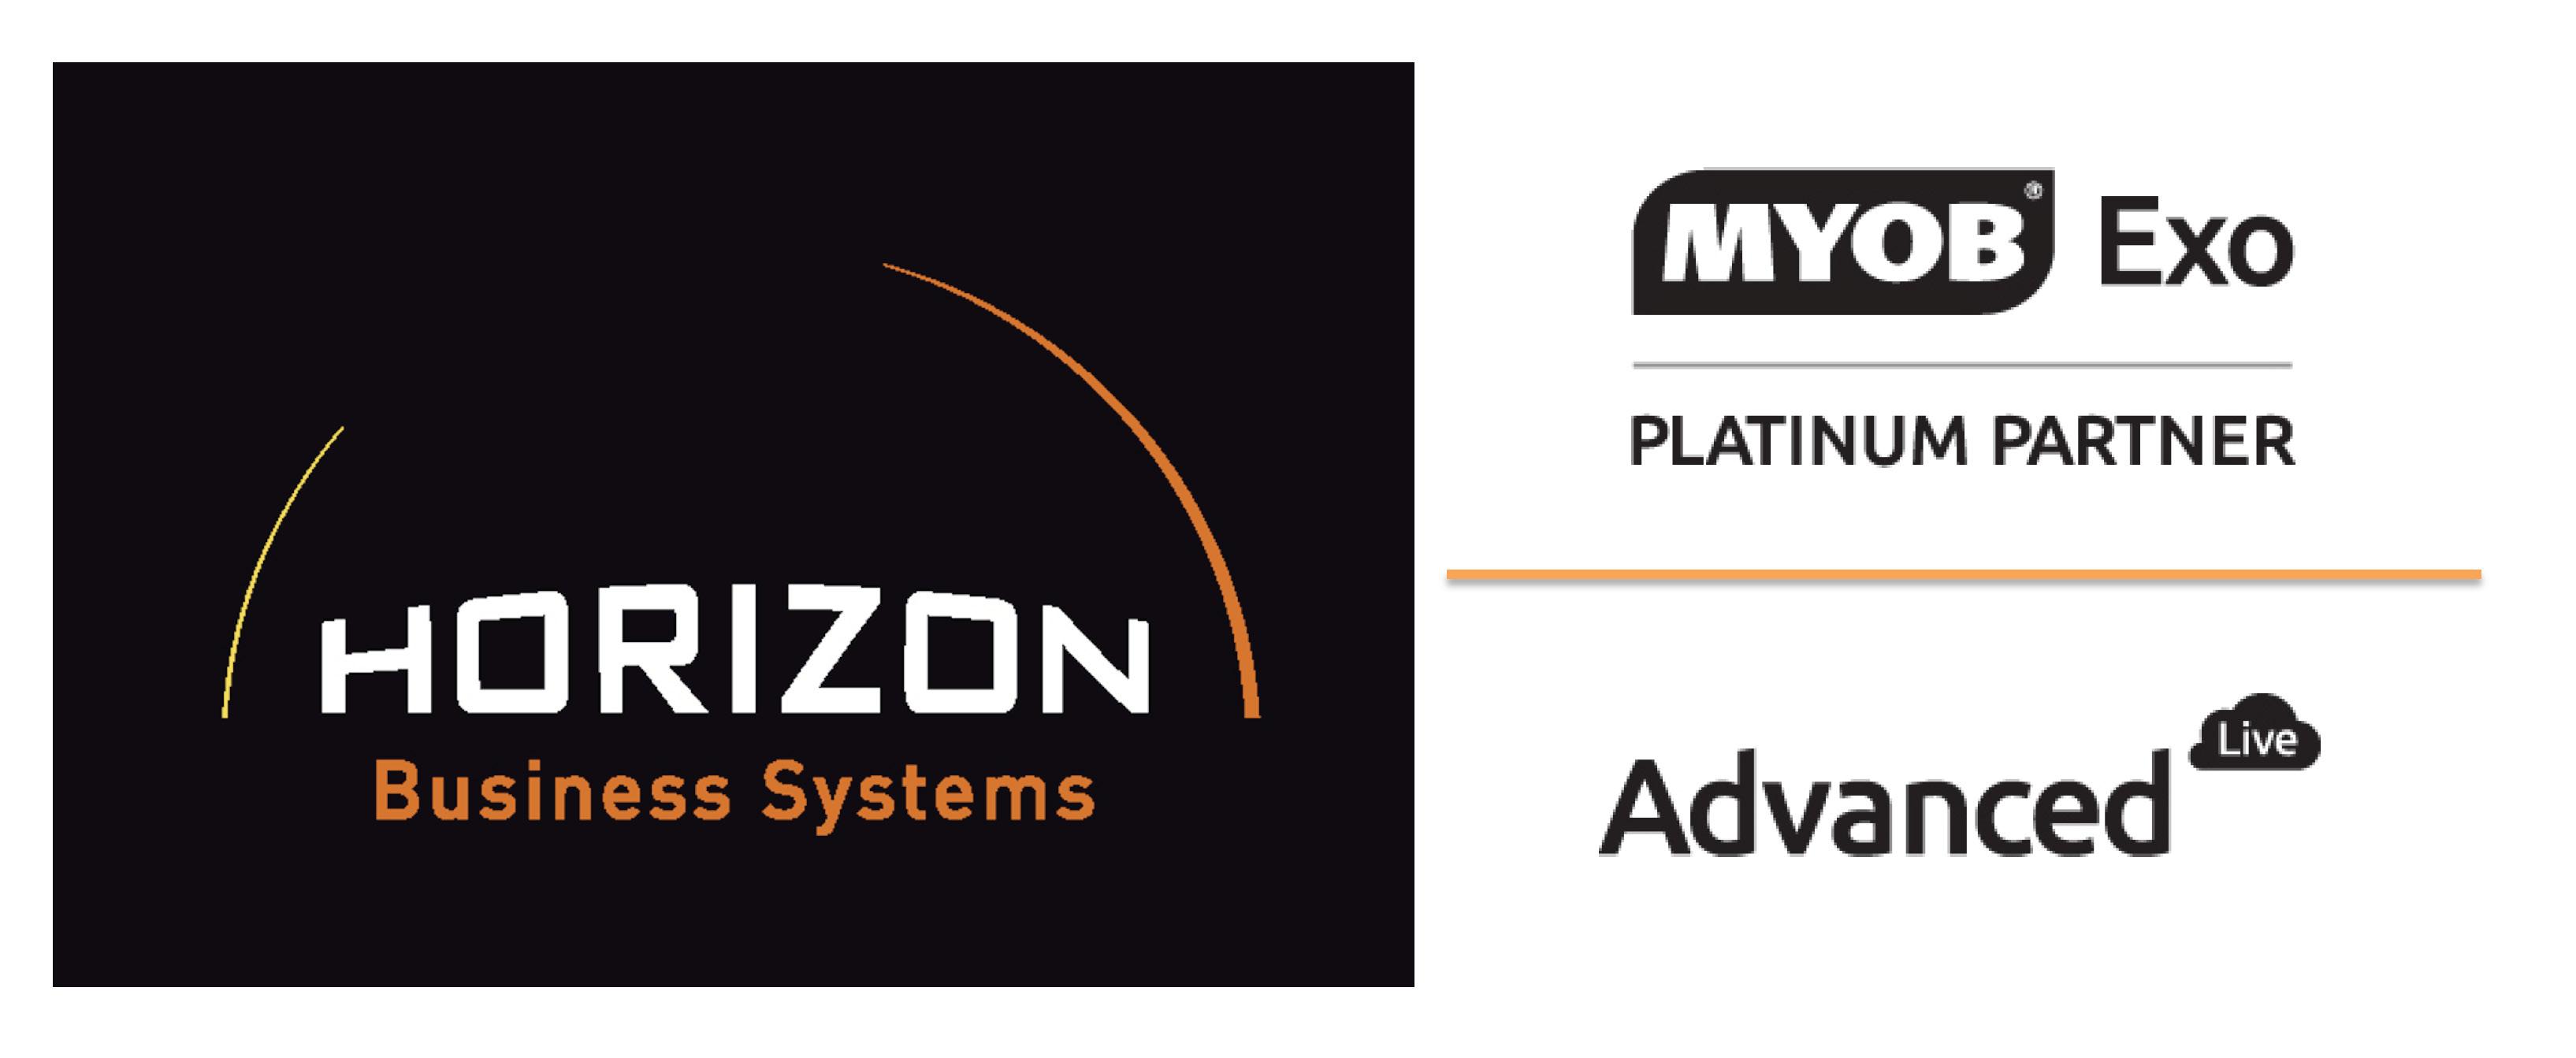 Horizon - Platinum Partner MYOB EXO & MYOB Advanced